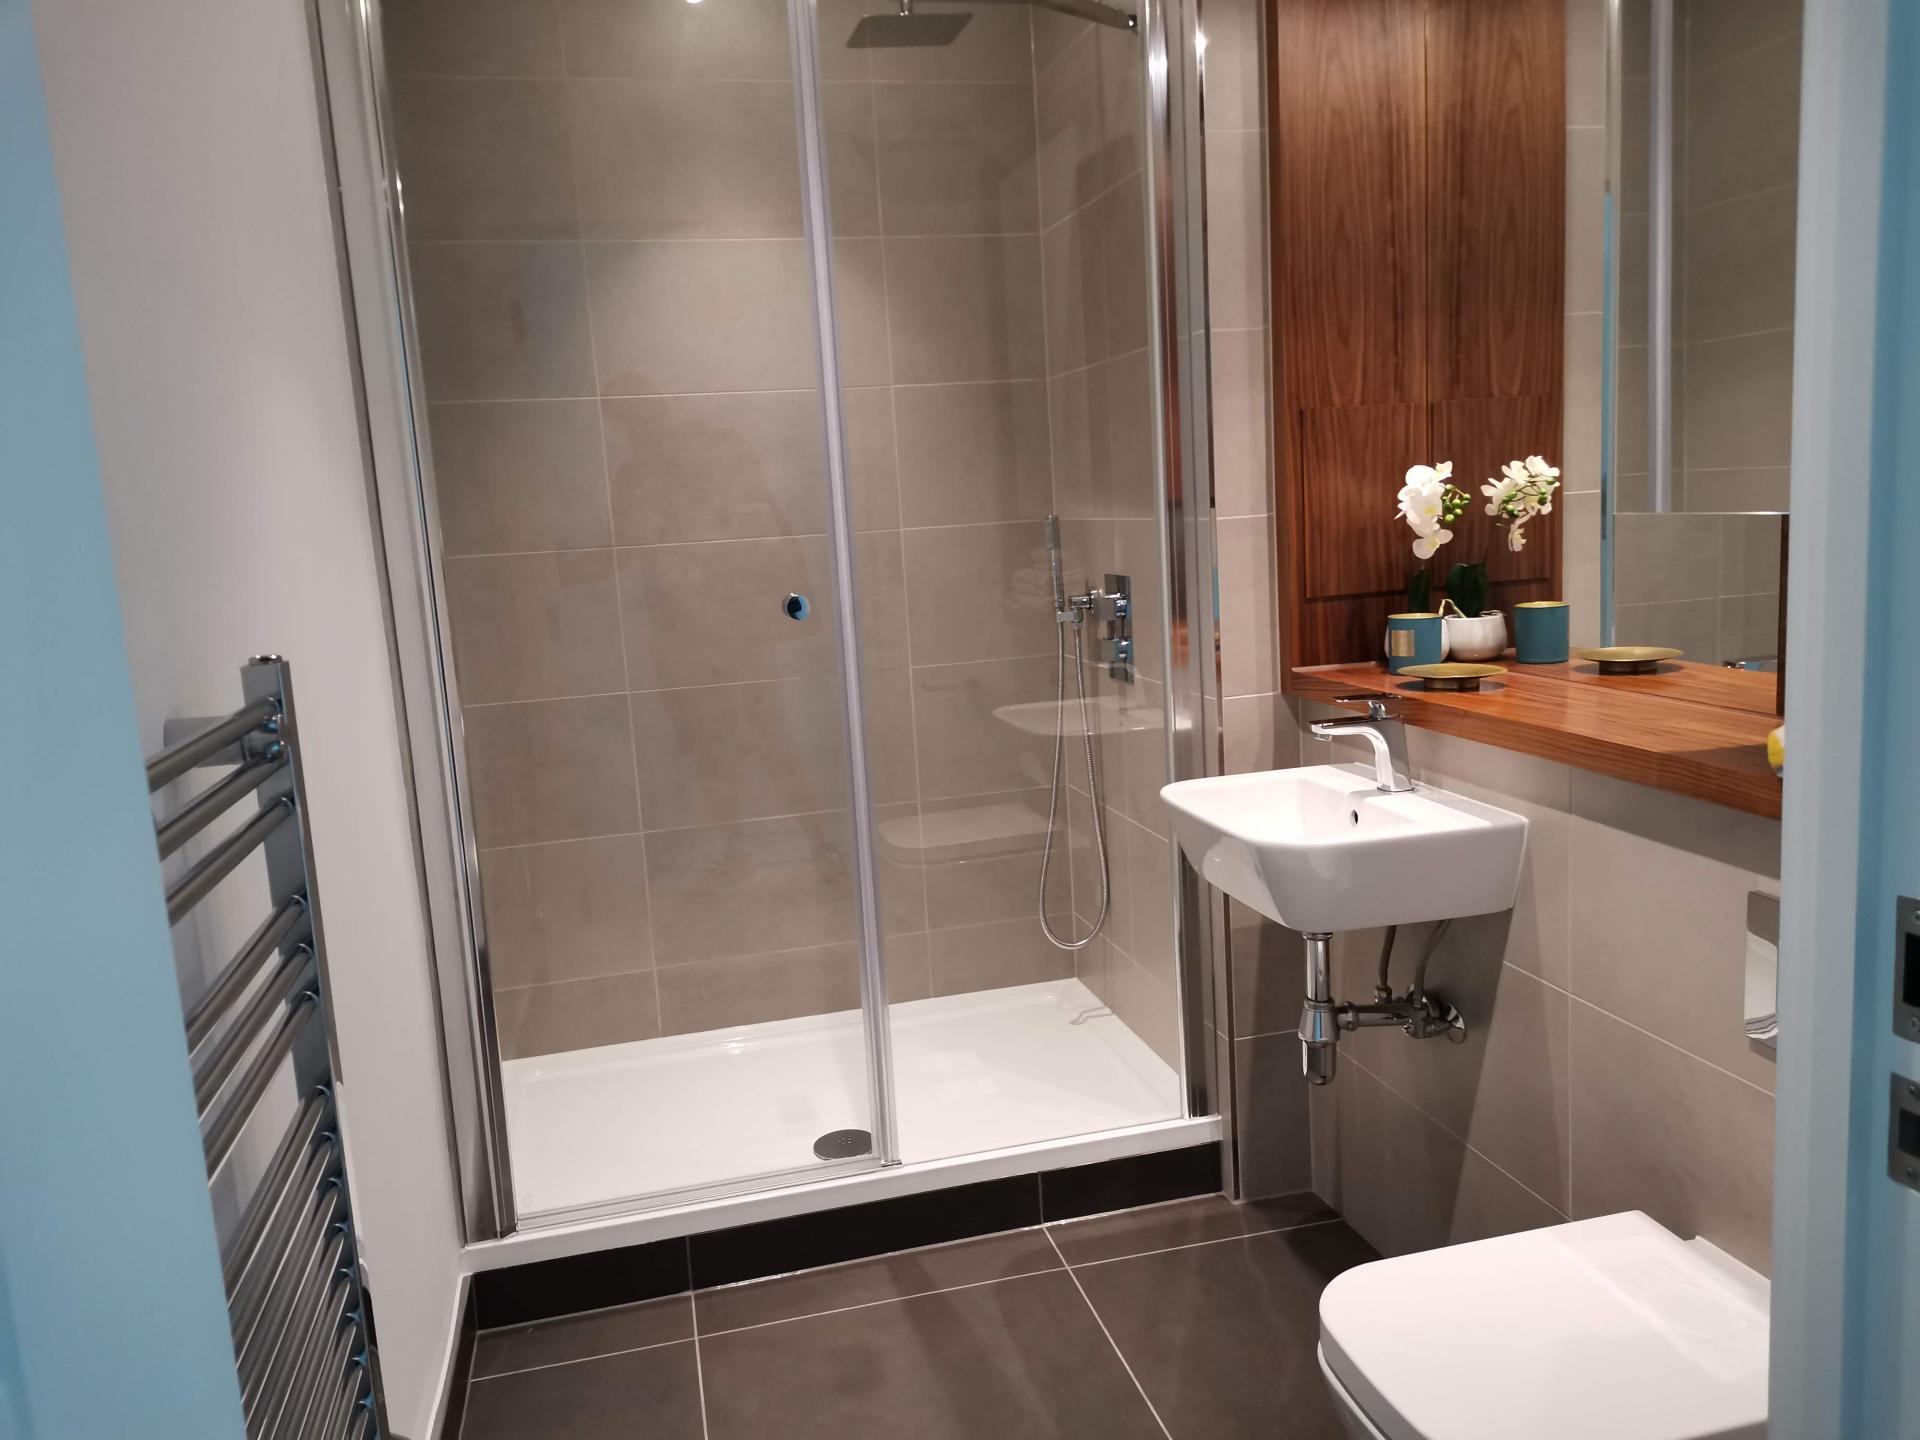 Bathroom at Charles Hope Canary Wharf, Canary Wharf, London